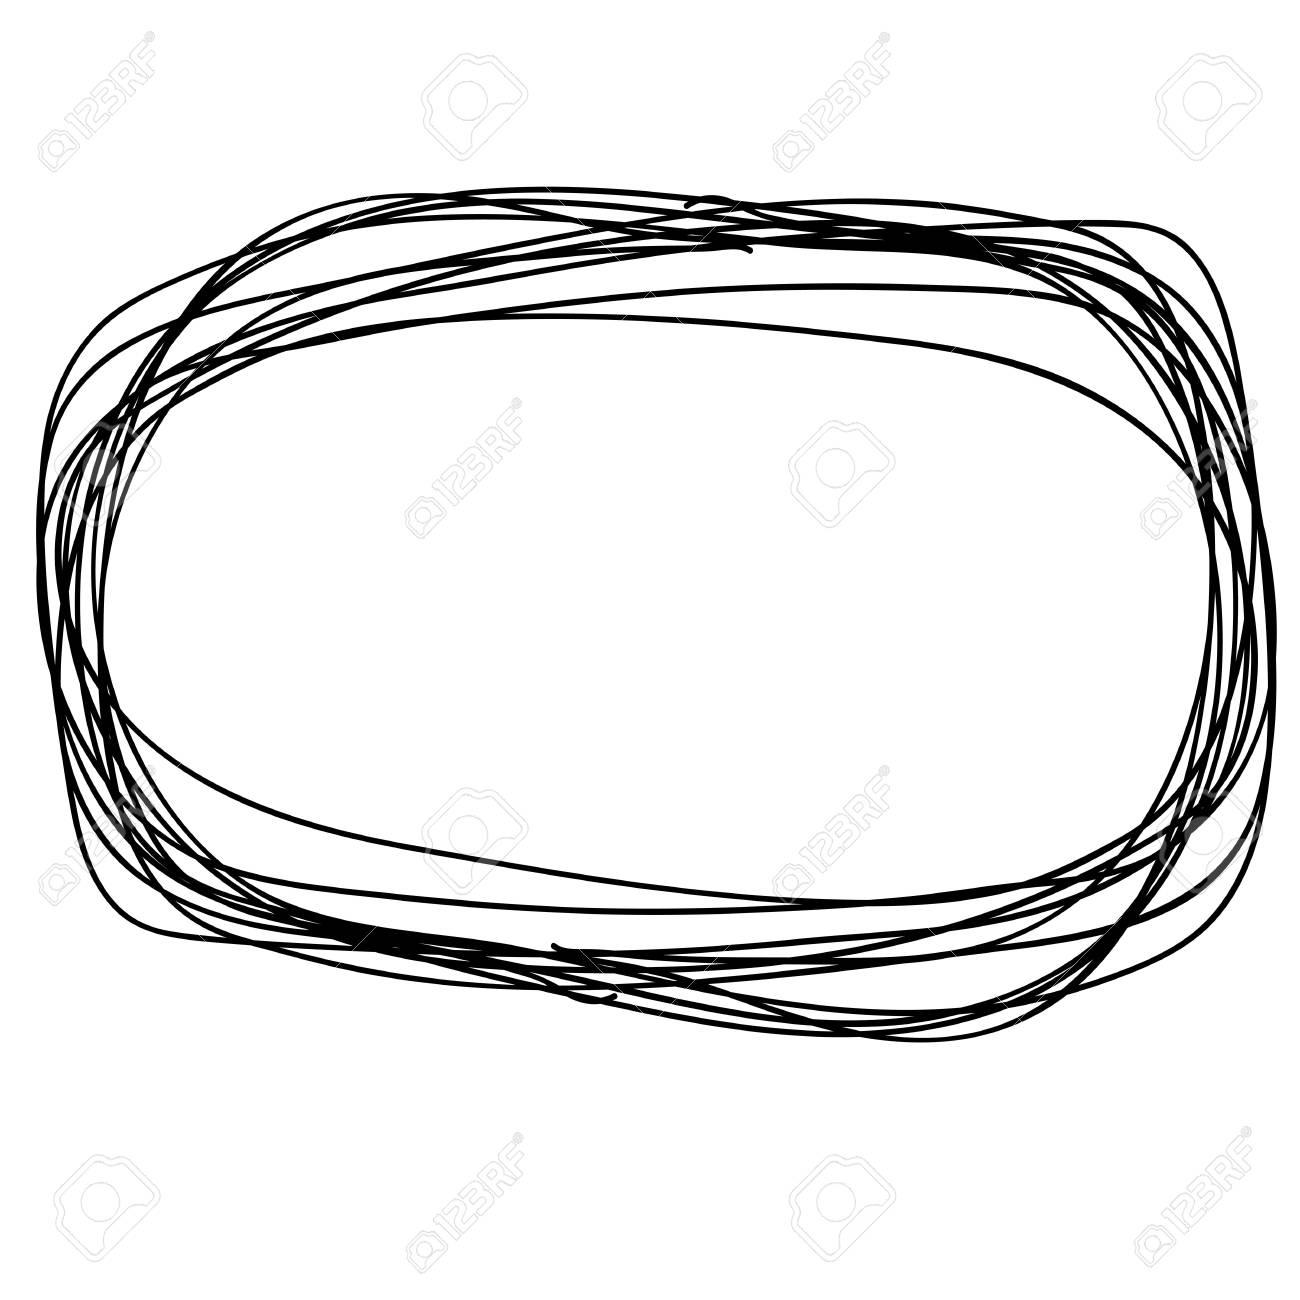 Hand drawn Circle sketch Doodle Frames. Vector illustration.